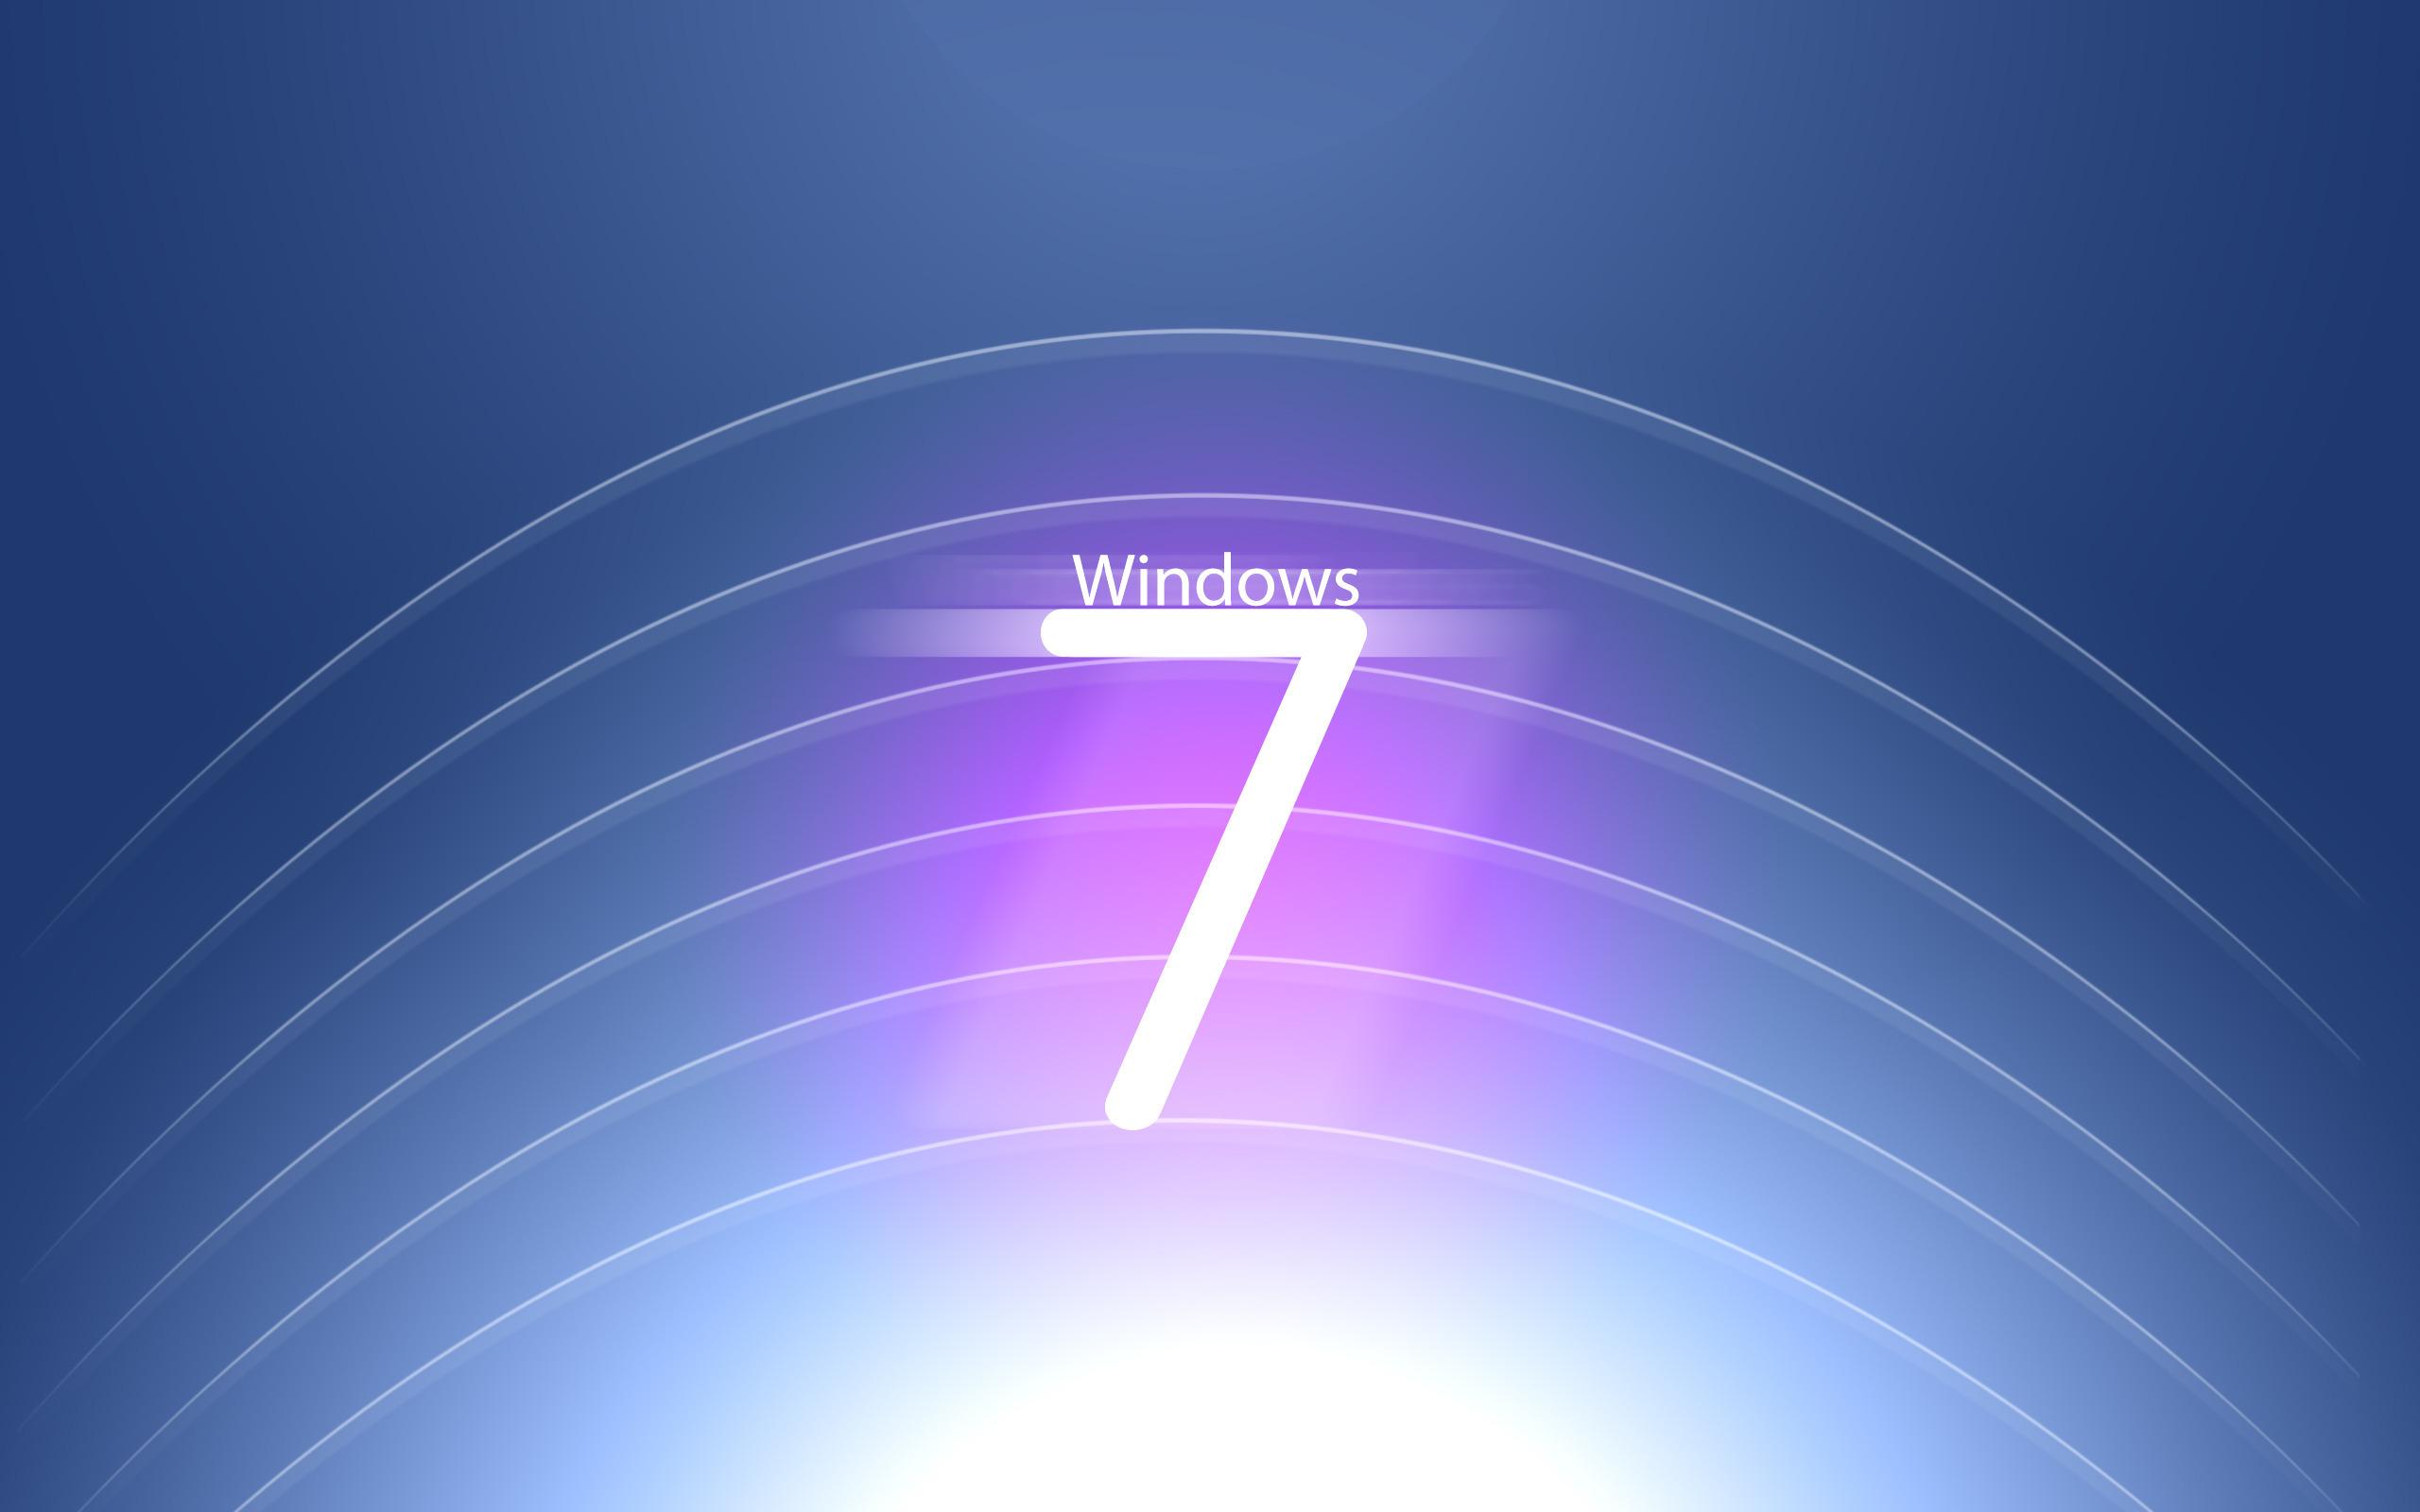 обои рабочего стола windows 7 природа 2388